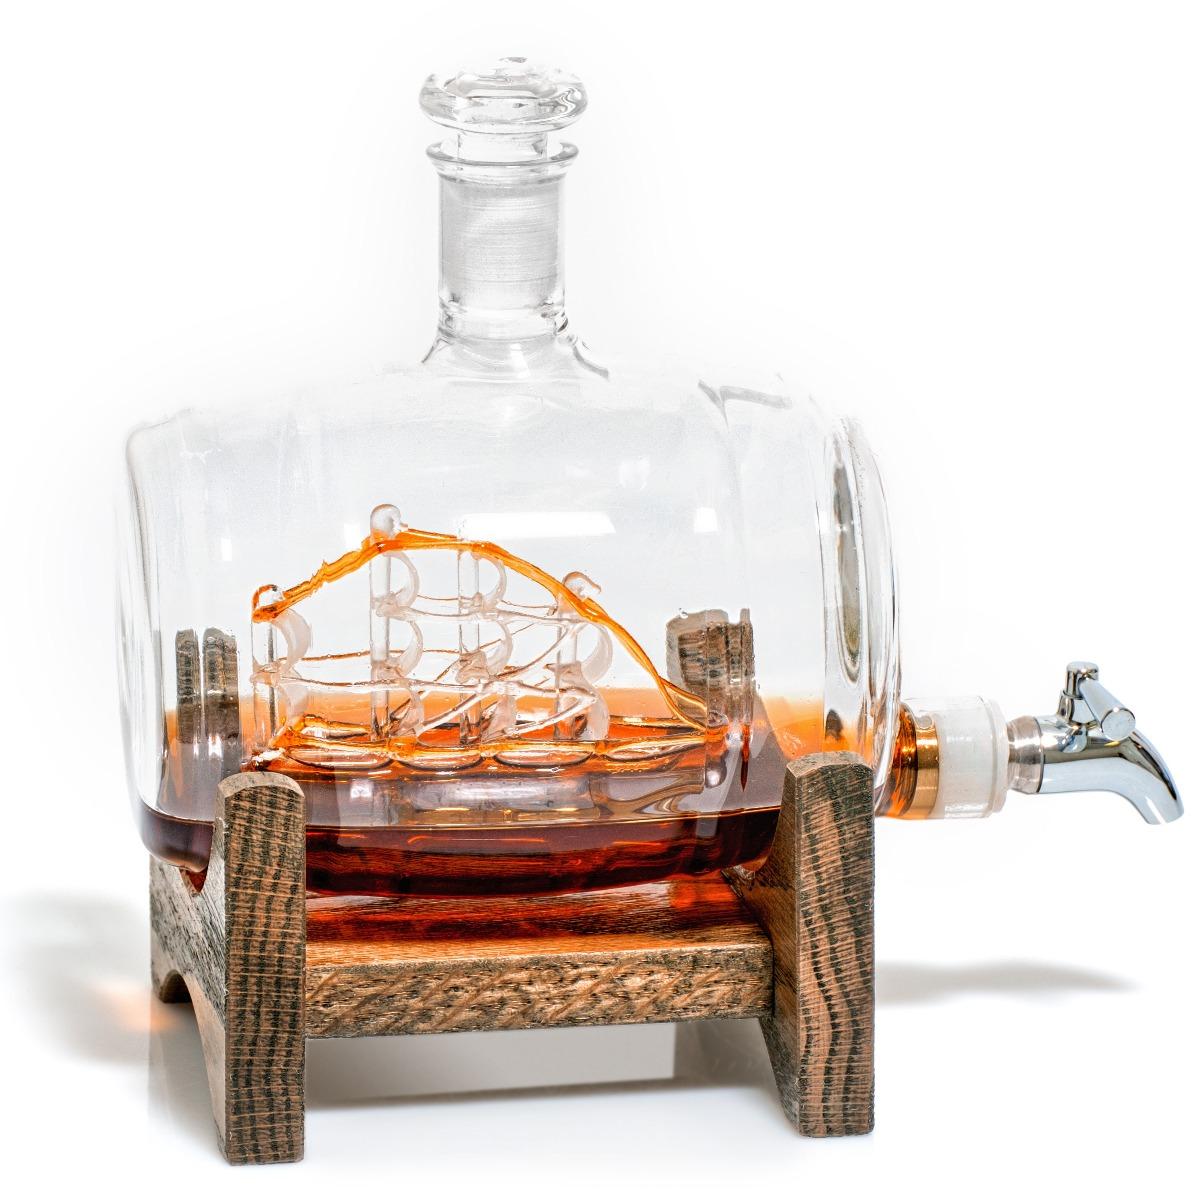 Barrel Shaped Liquor/Wine Decanter with a Ship Inside